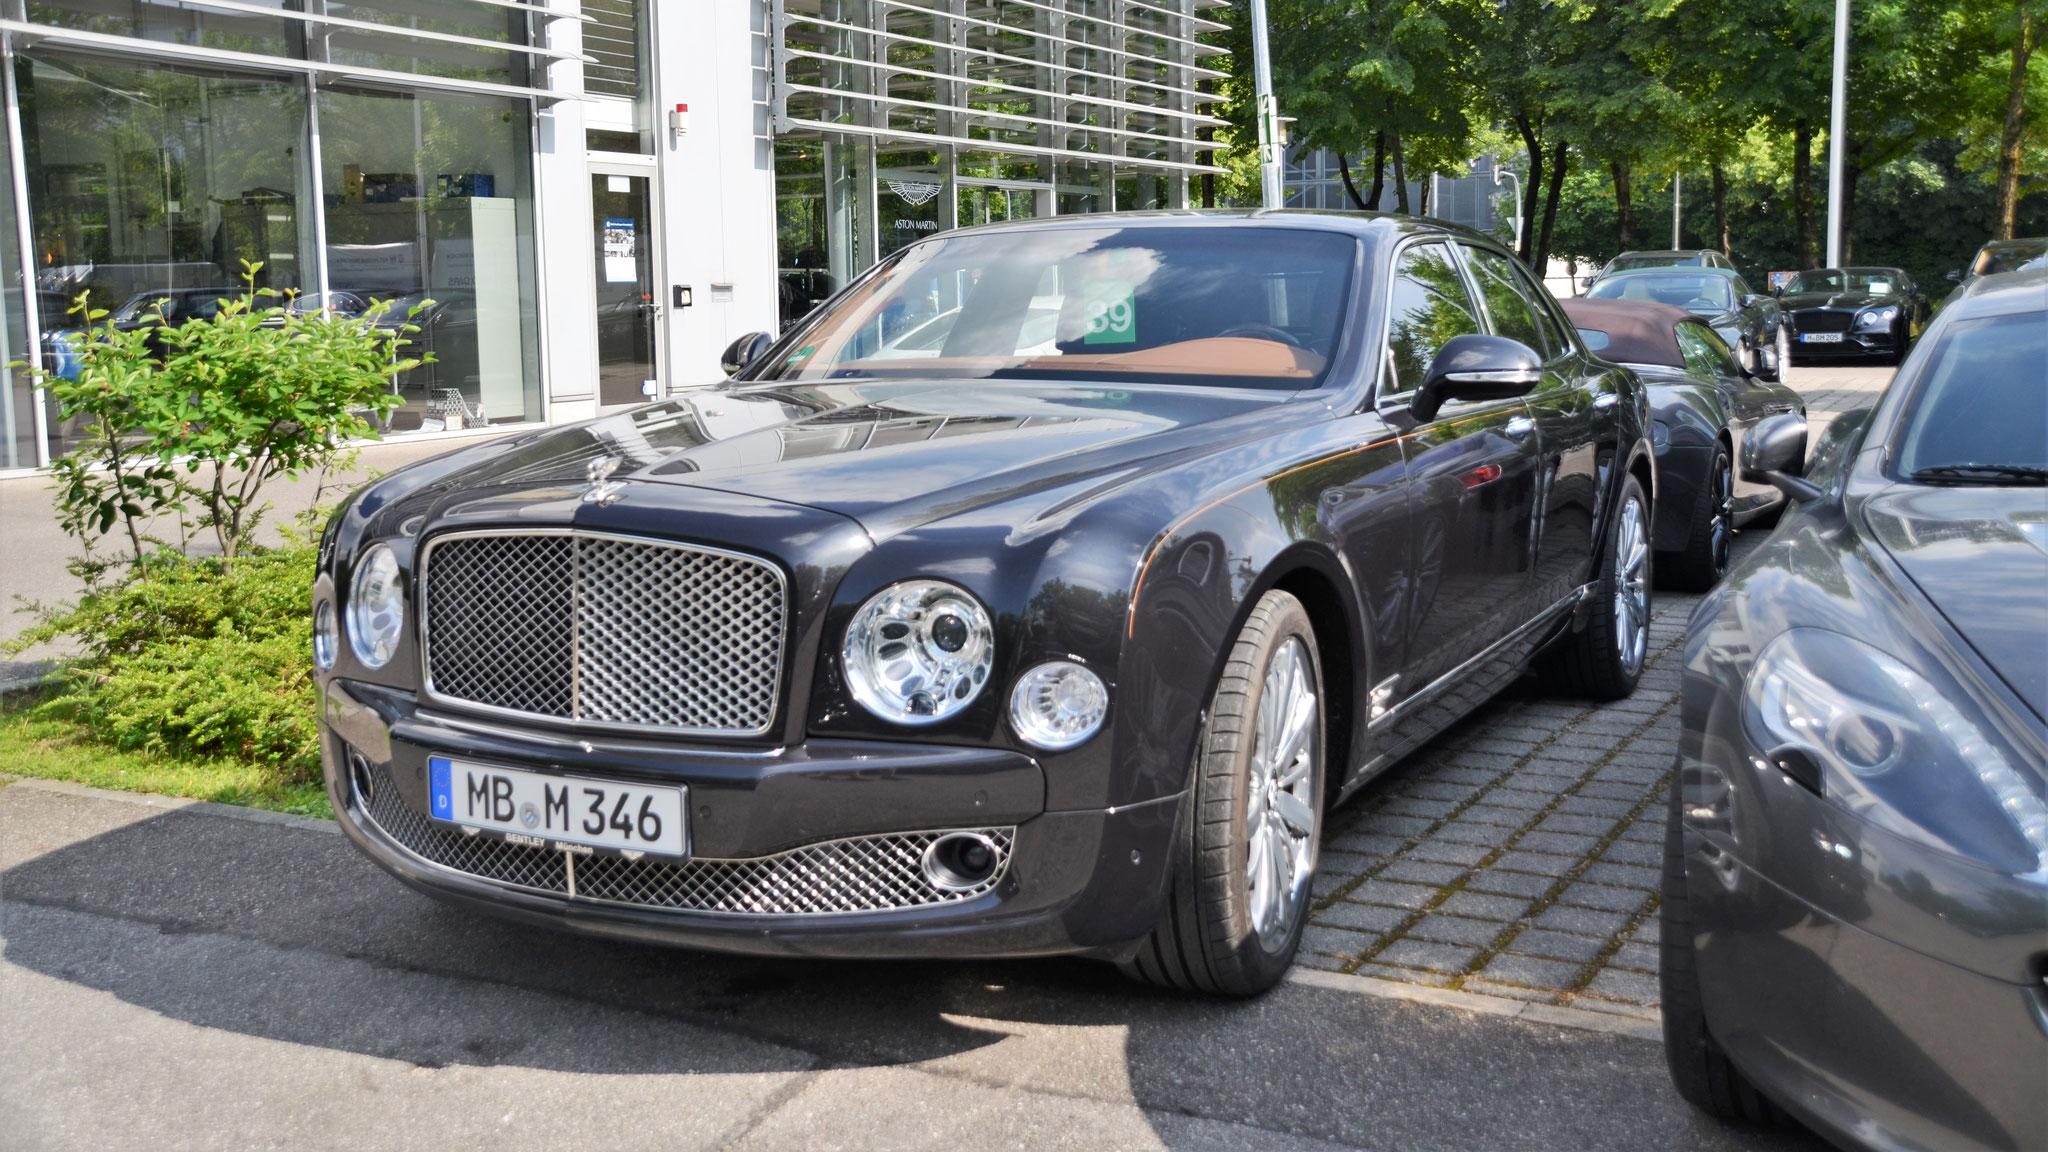 Bentley Mulsanne - MB-M-346